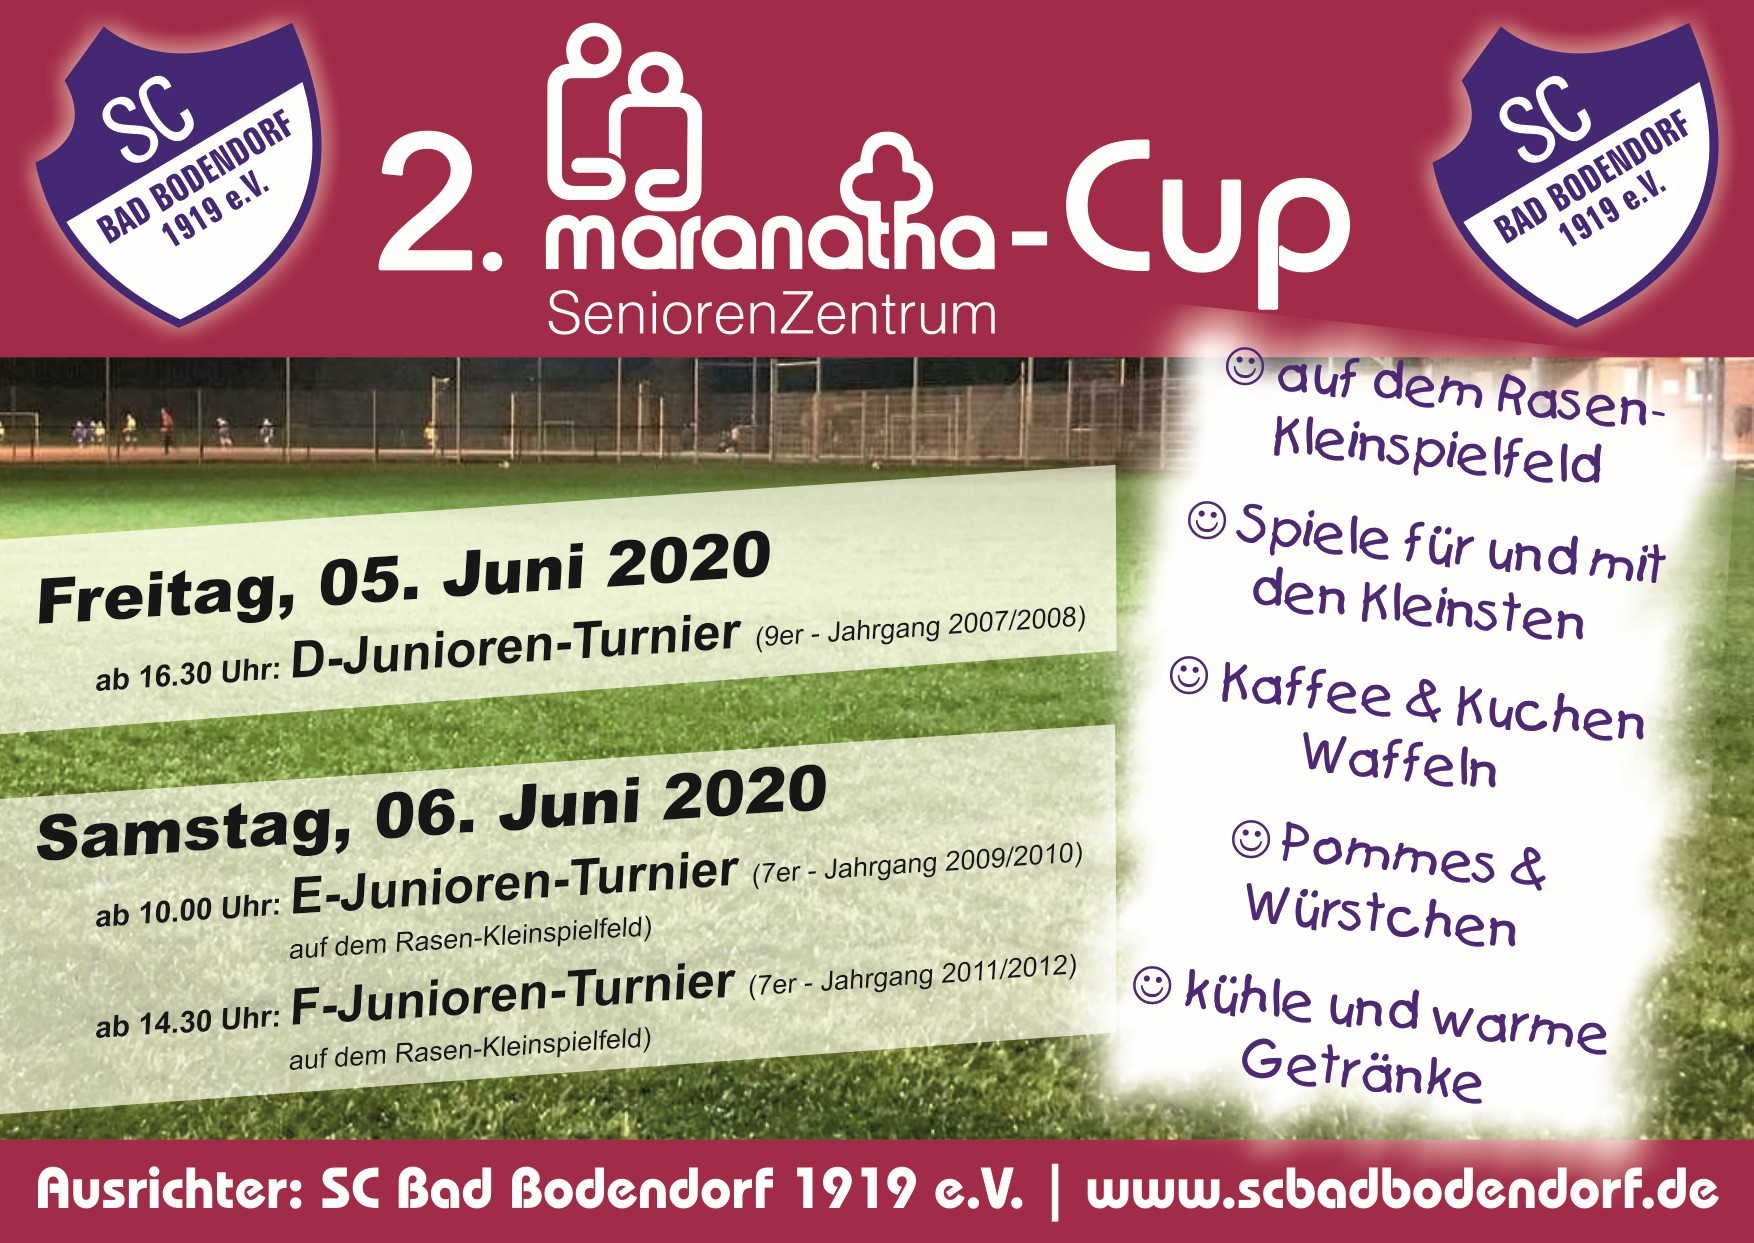 2 Maranatha Cup 20 050620 200220 1